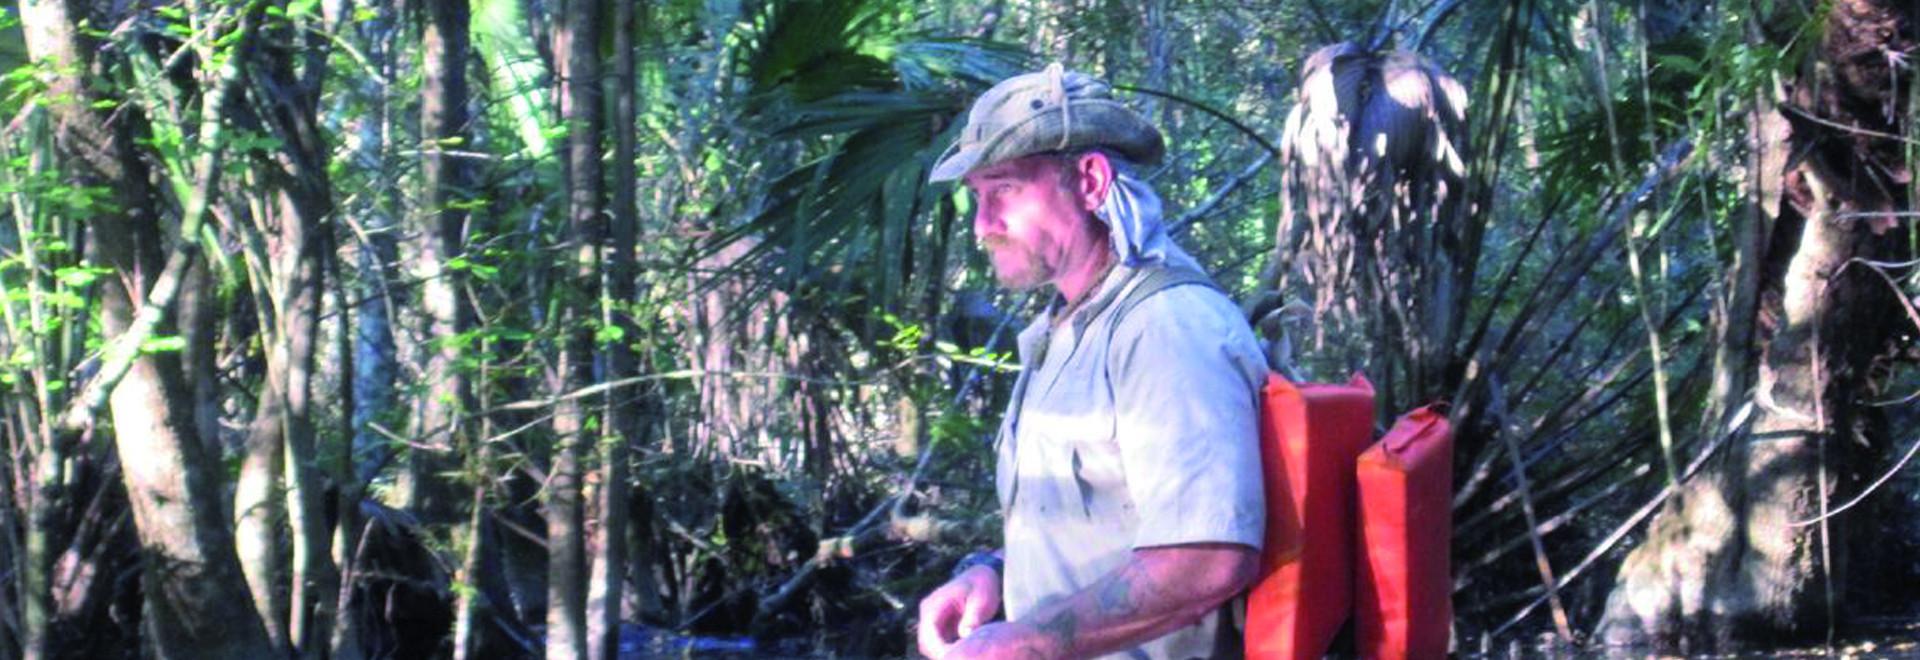 L'isola degli ippopotami